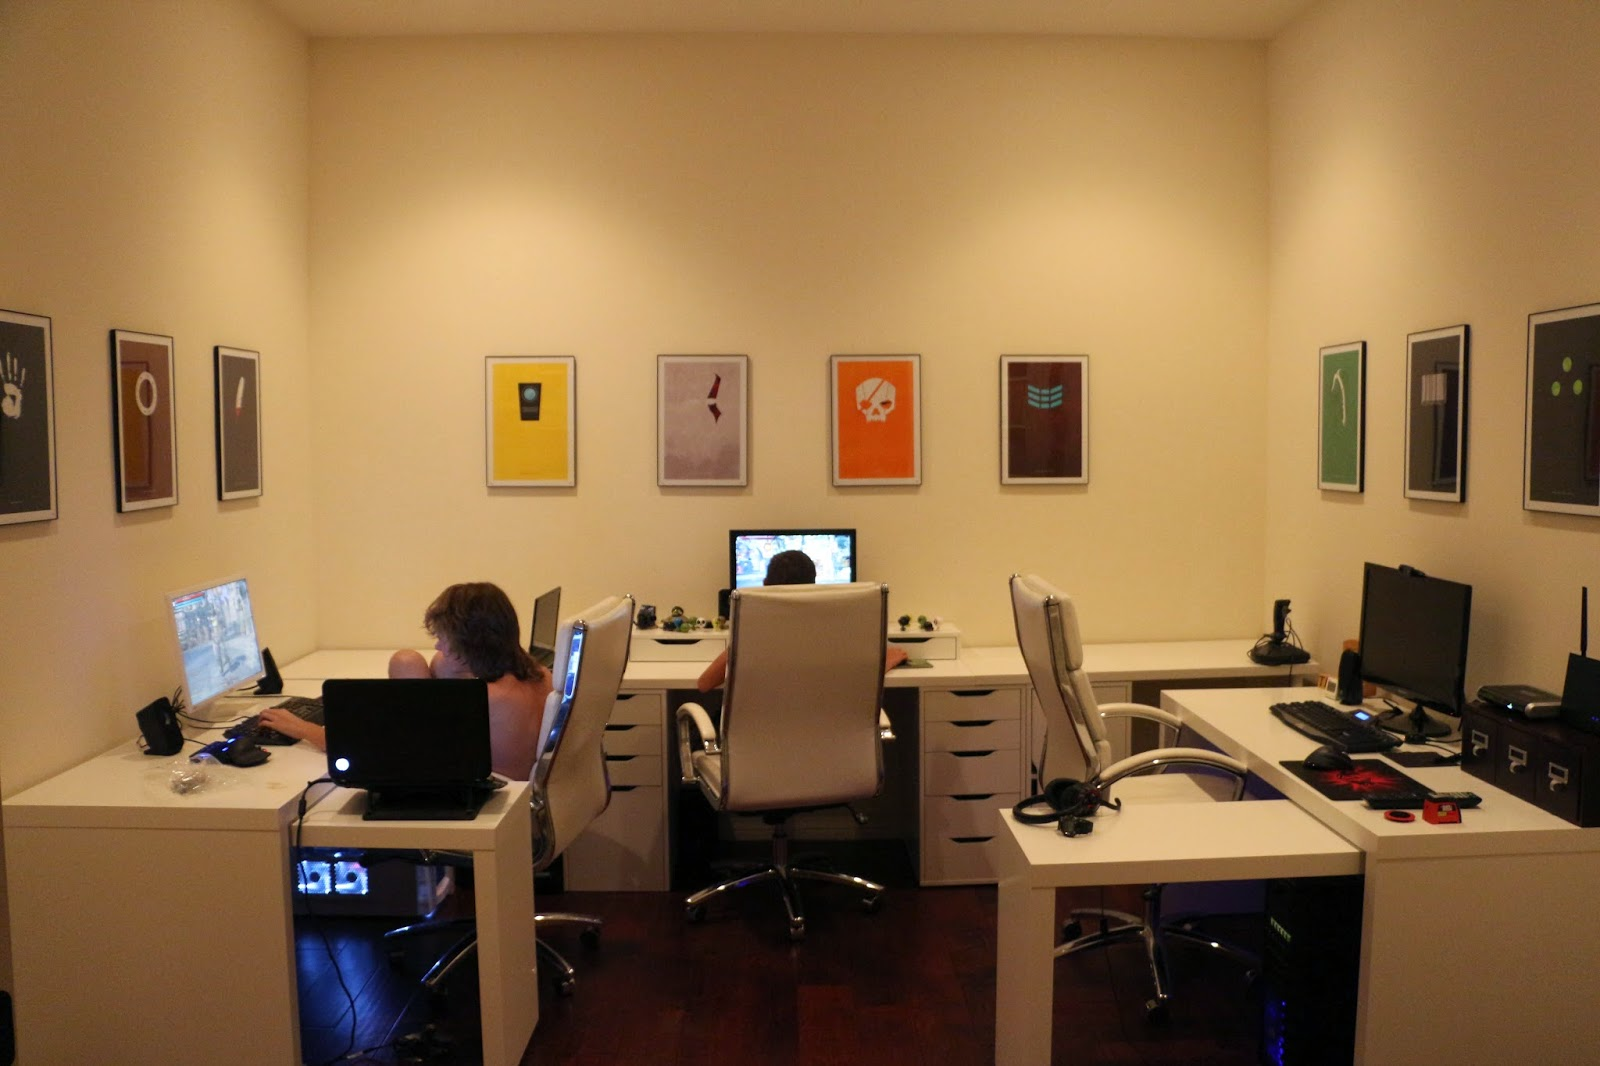 computer room, gamer room design, minimalist video game posters,